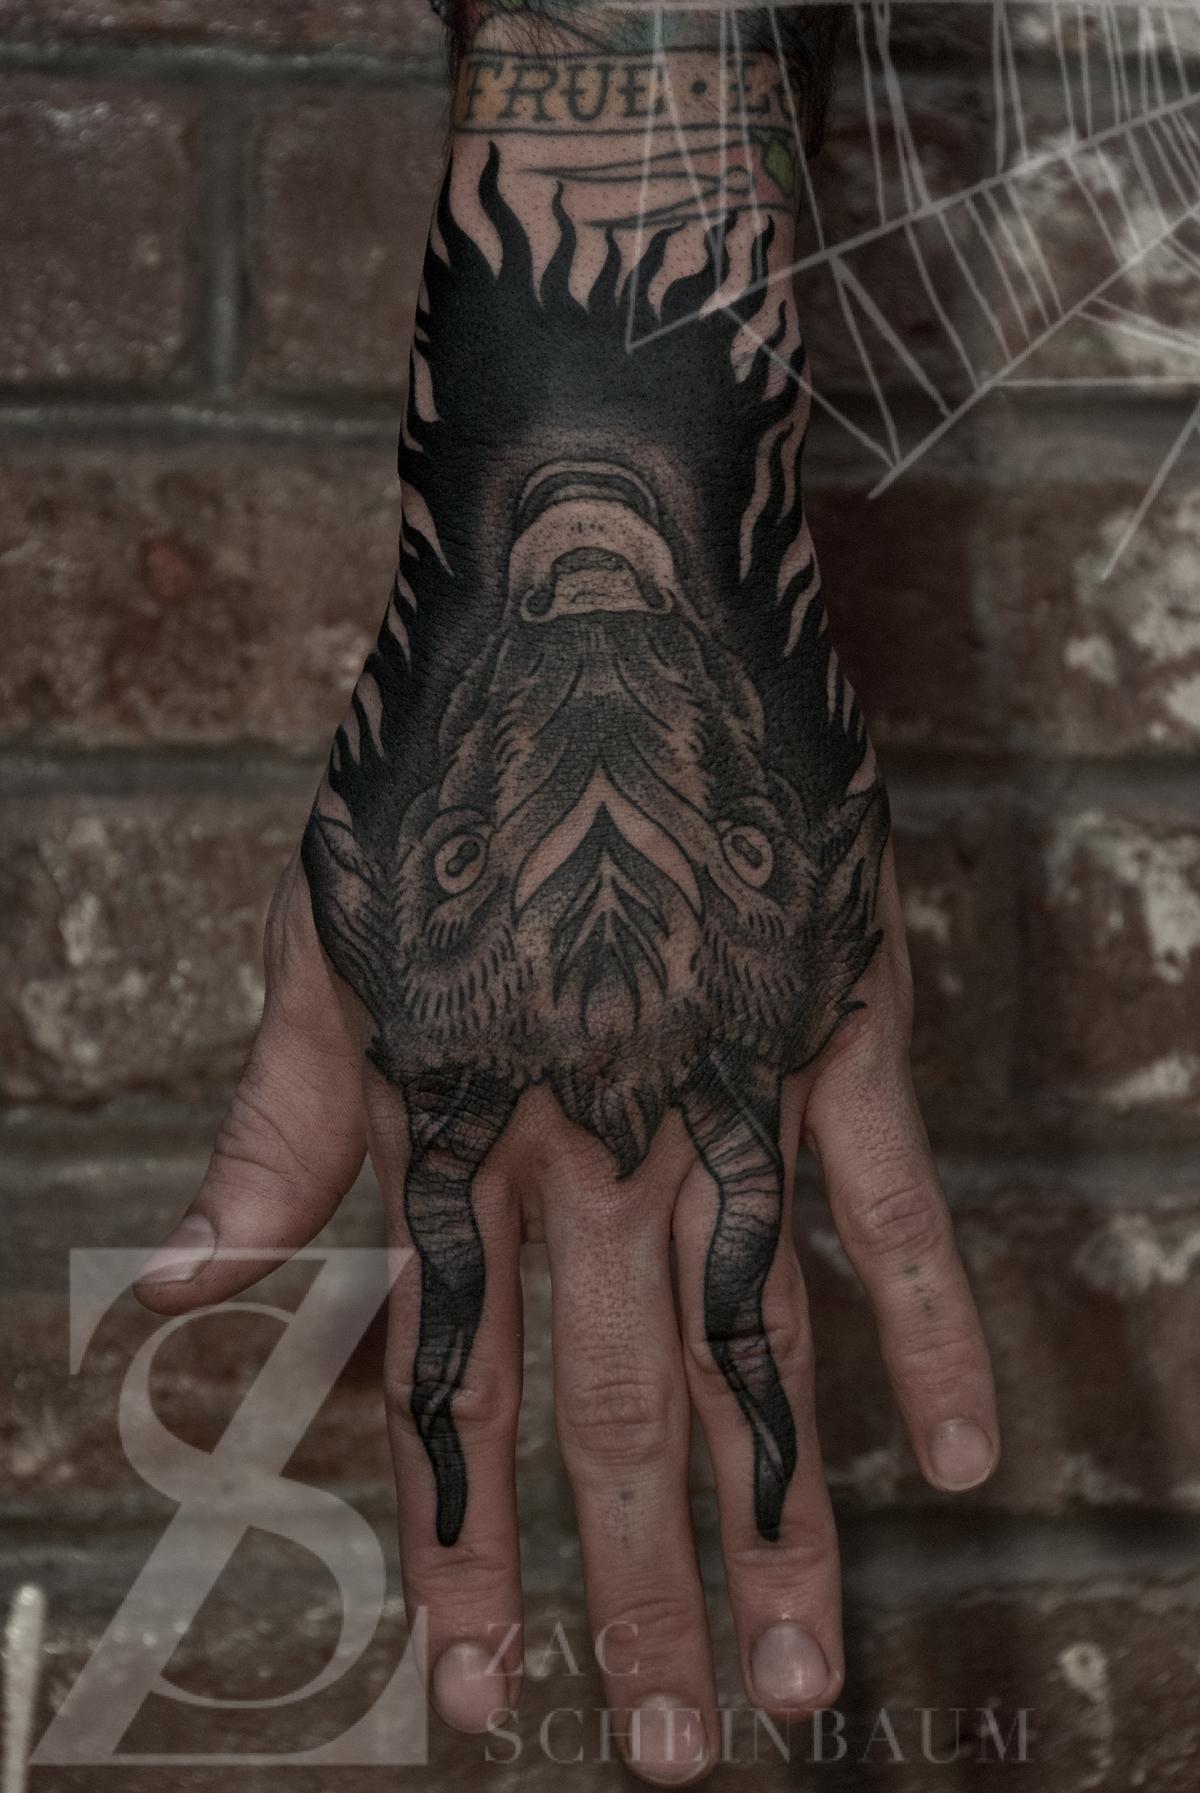 zac-scheinbaum-saved-tattoo-goat-hand-2011-2012-1.jpg